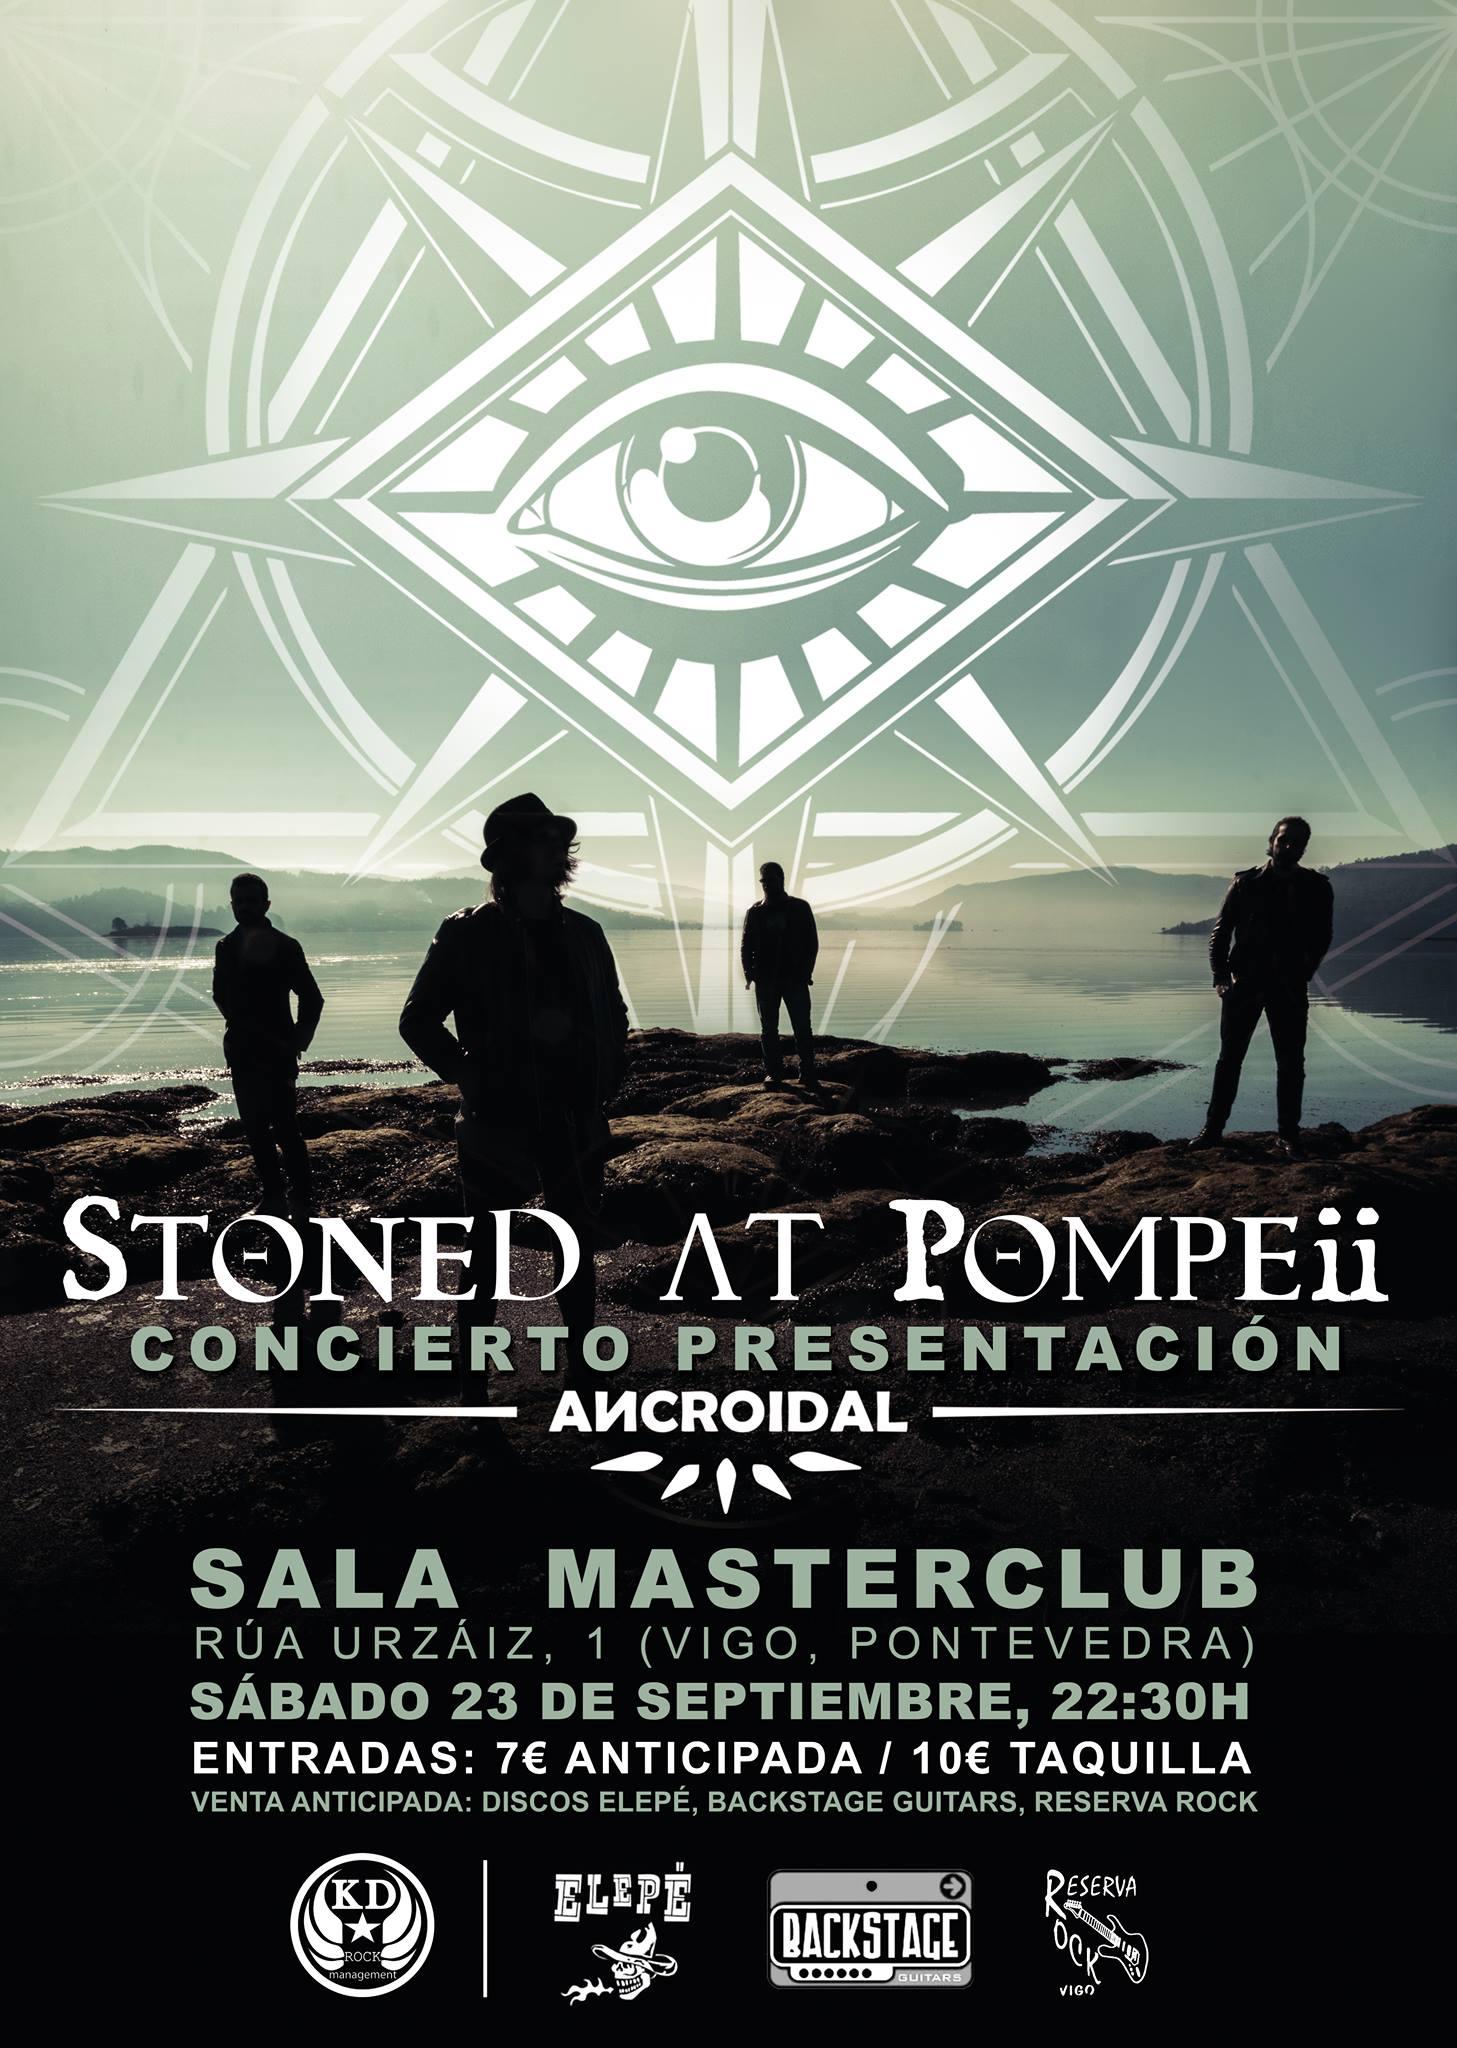 STONED AT POMPEII – Concierto presentación ANCROIDAL